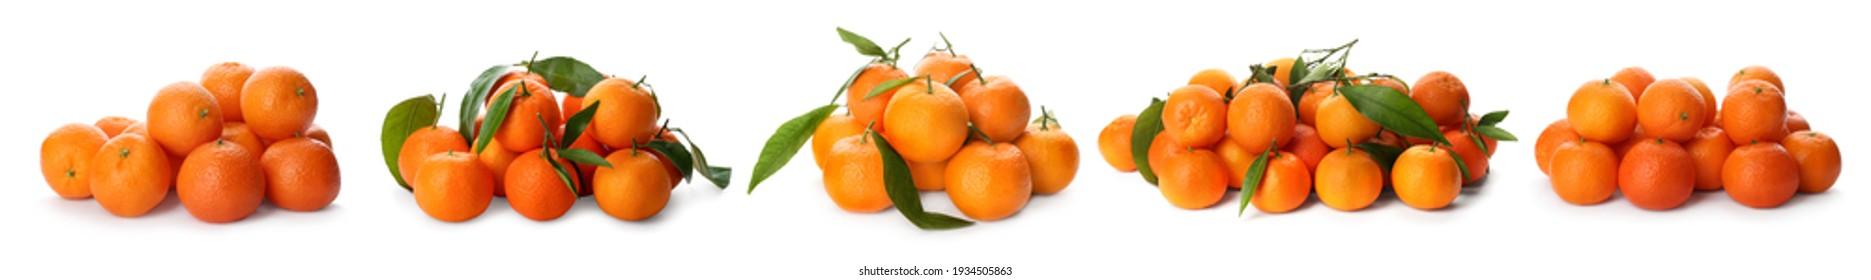 Set with fresh ripe tangerines on white background. Banner design